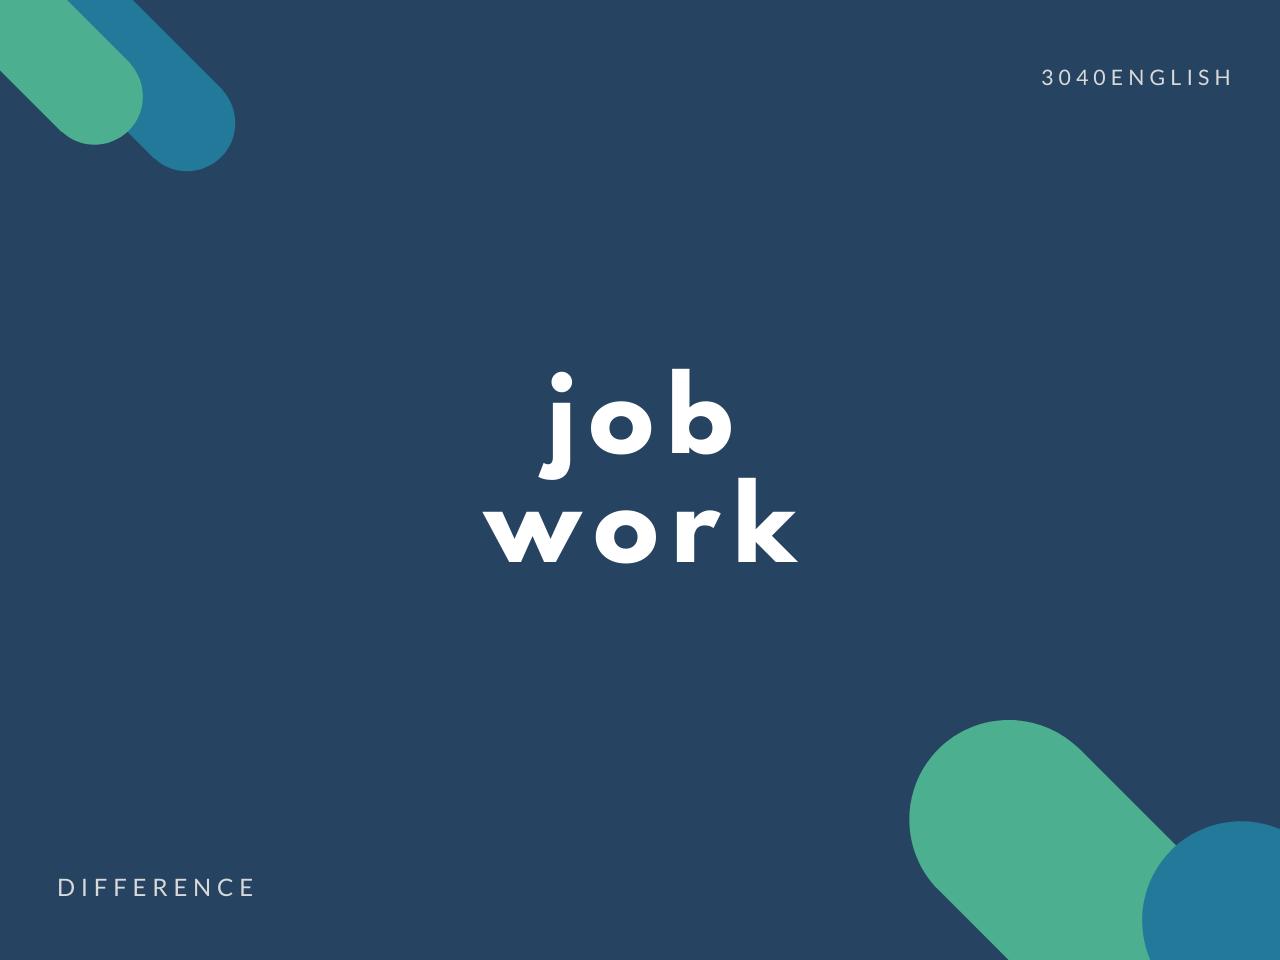 job と work の違いとは?【説明 / 例文あり】